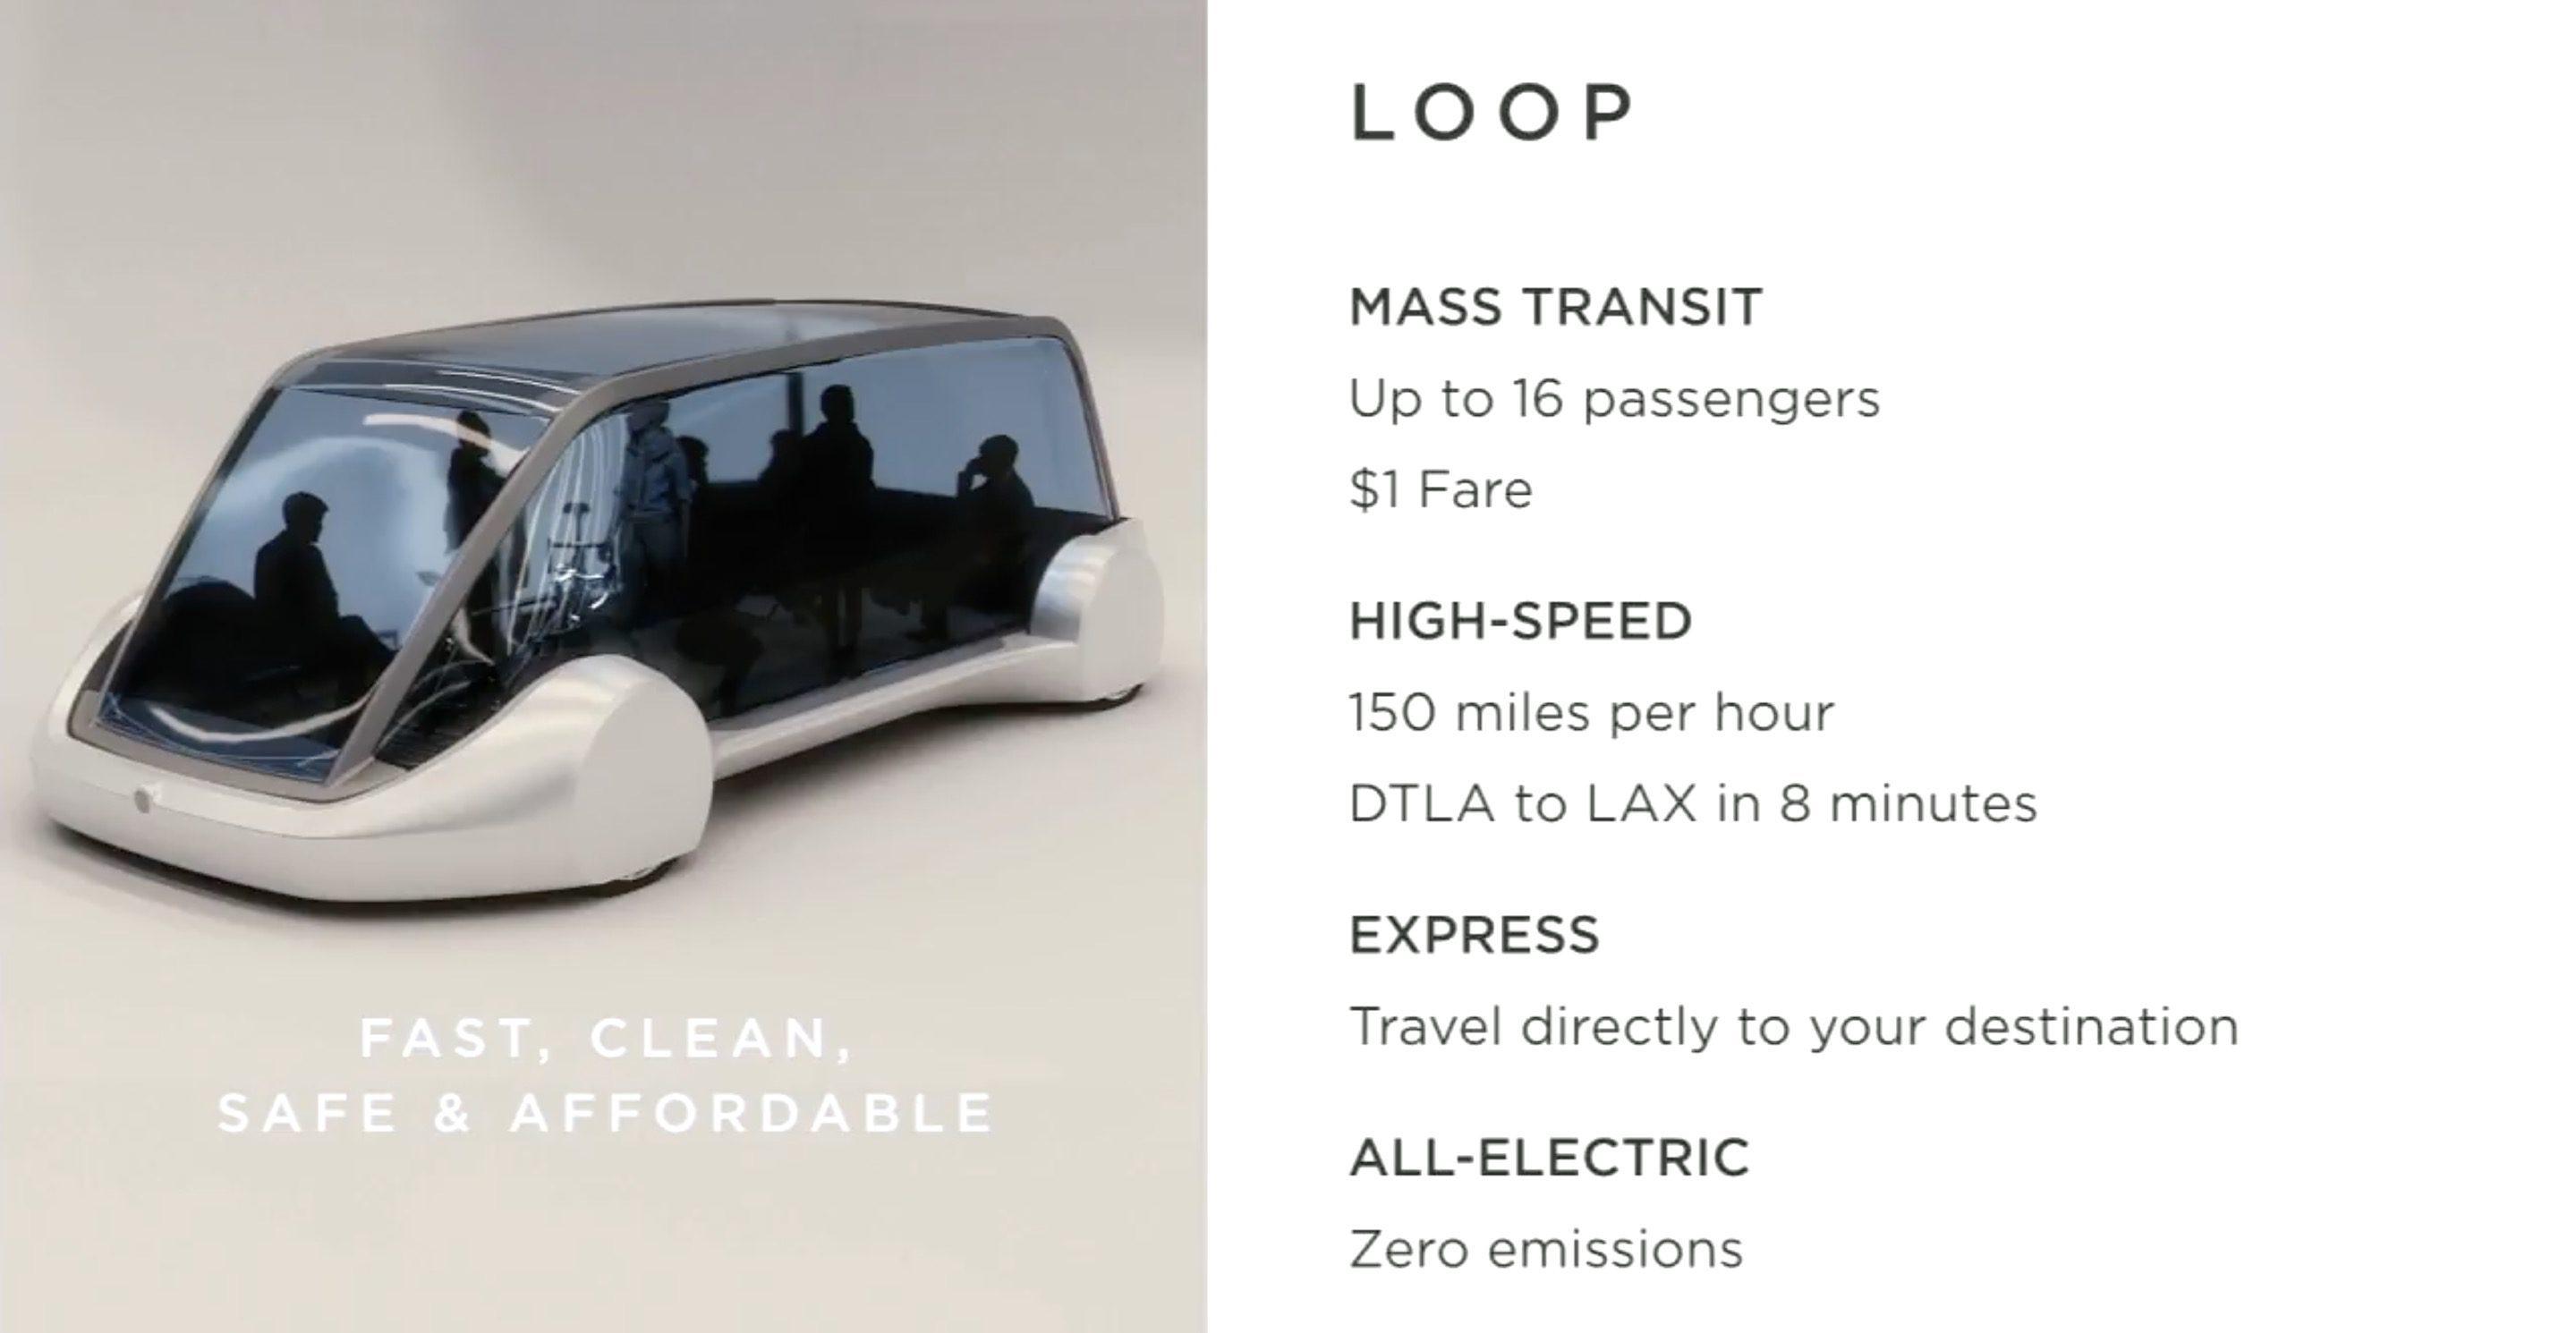 "I fremtiden kan du reise med Elon Musk-""toget"" for en tier."